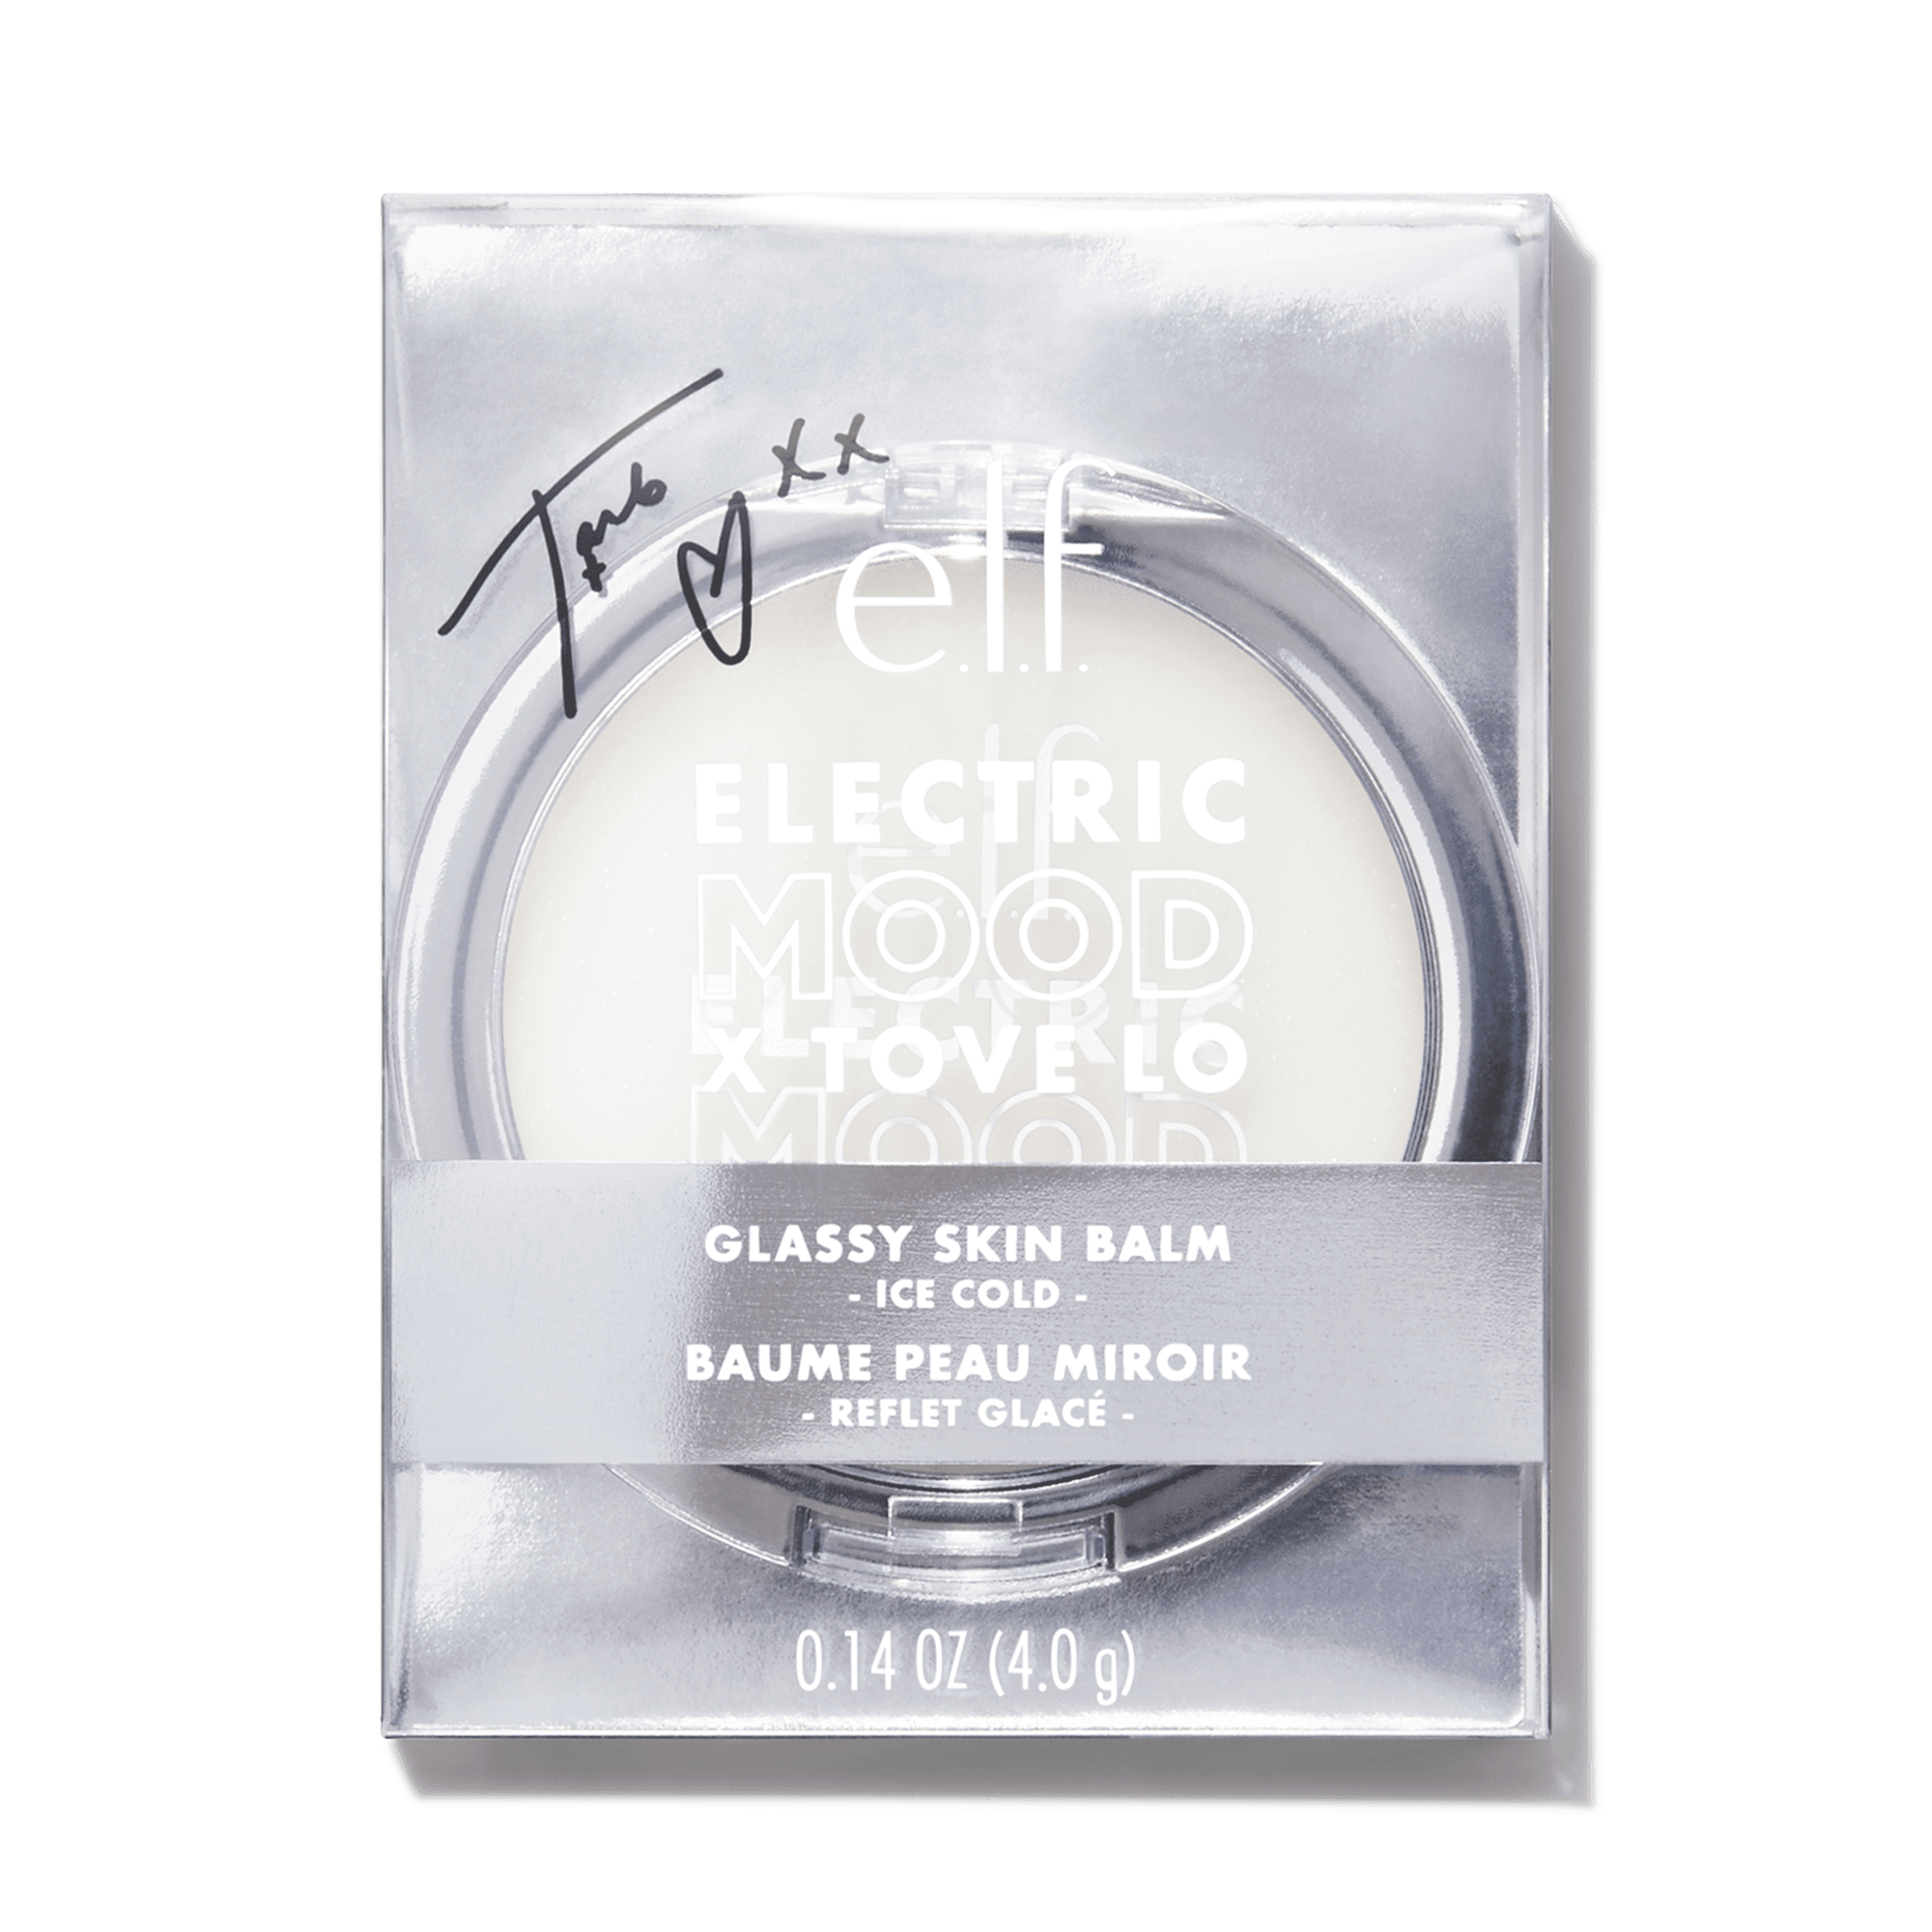 glassy skin balm